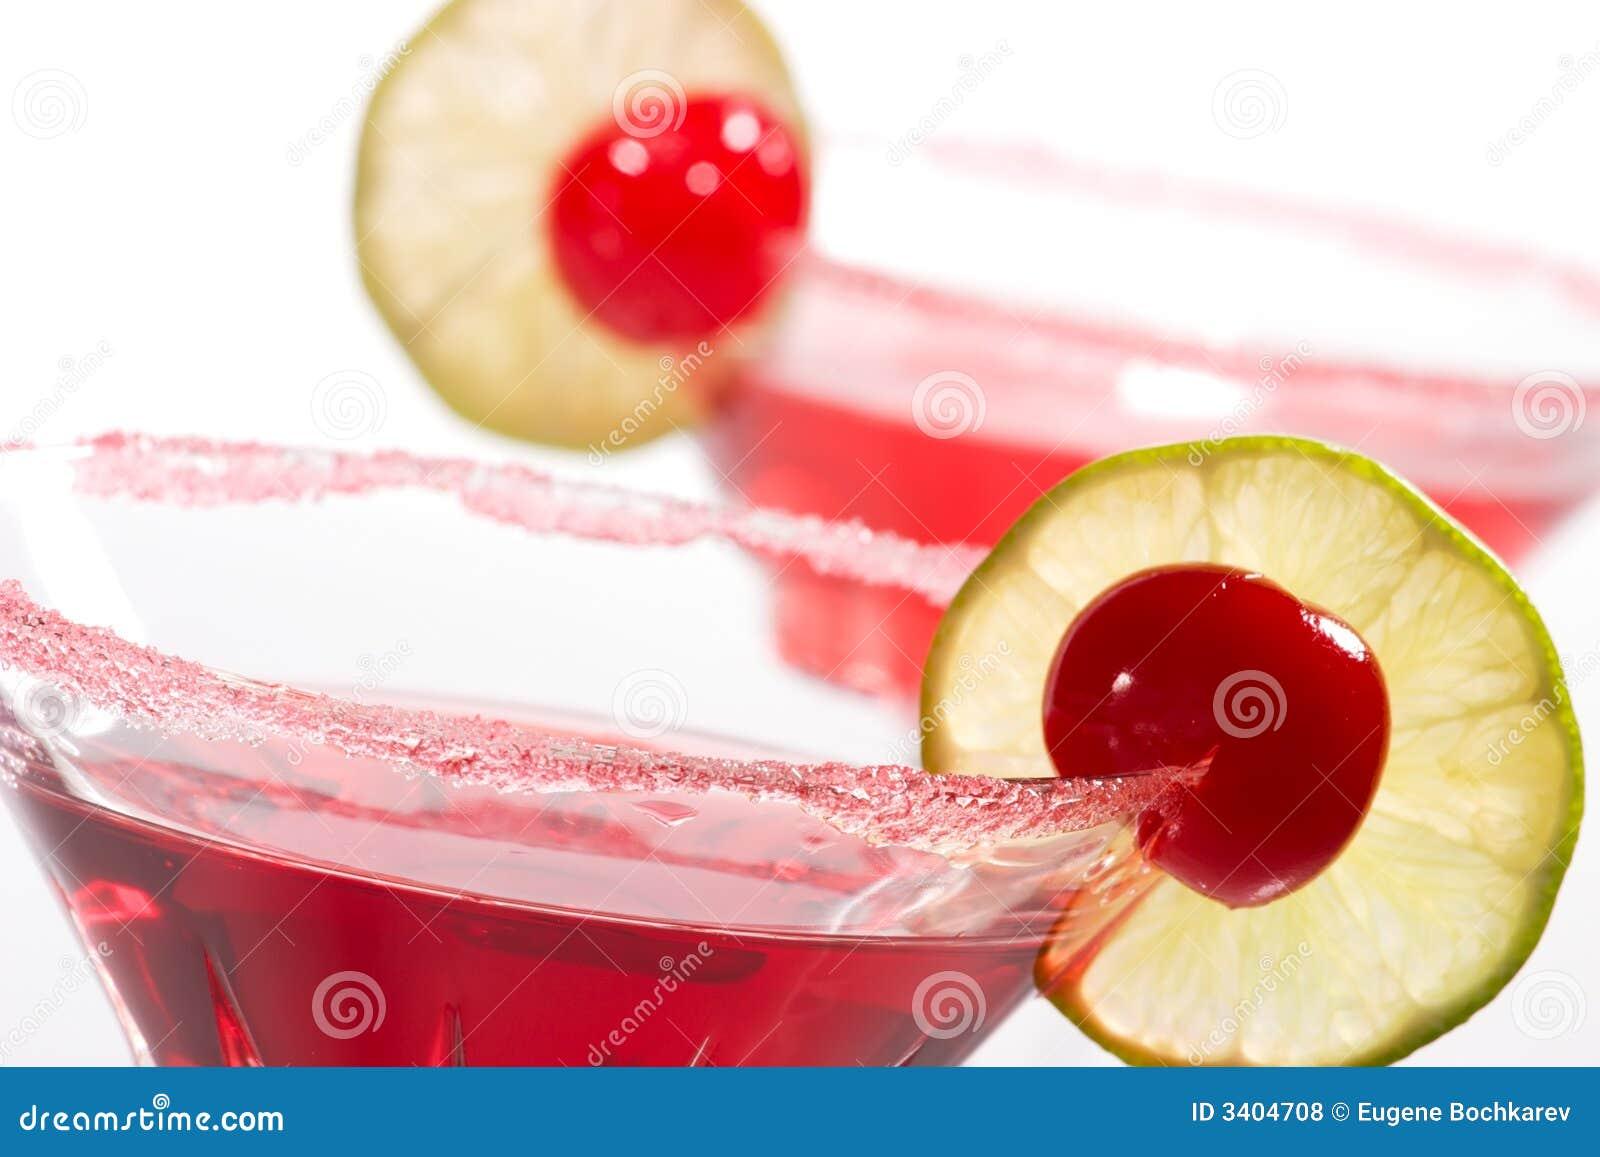 Most popular cocktails series